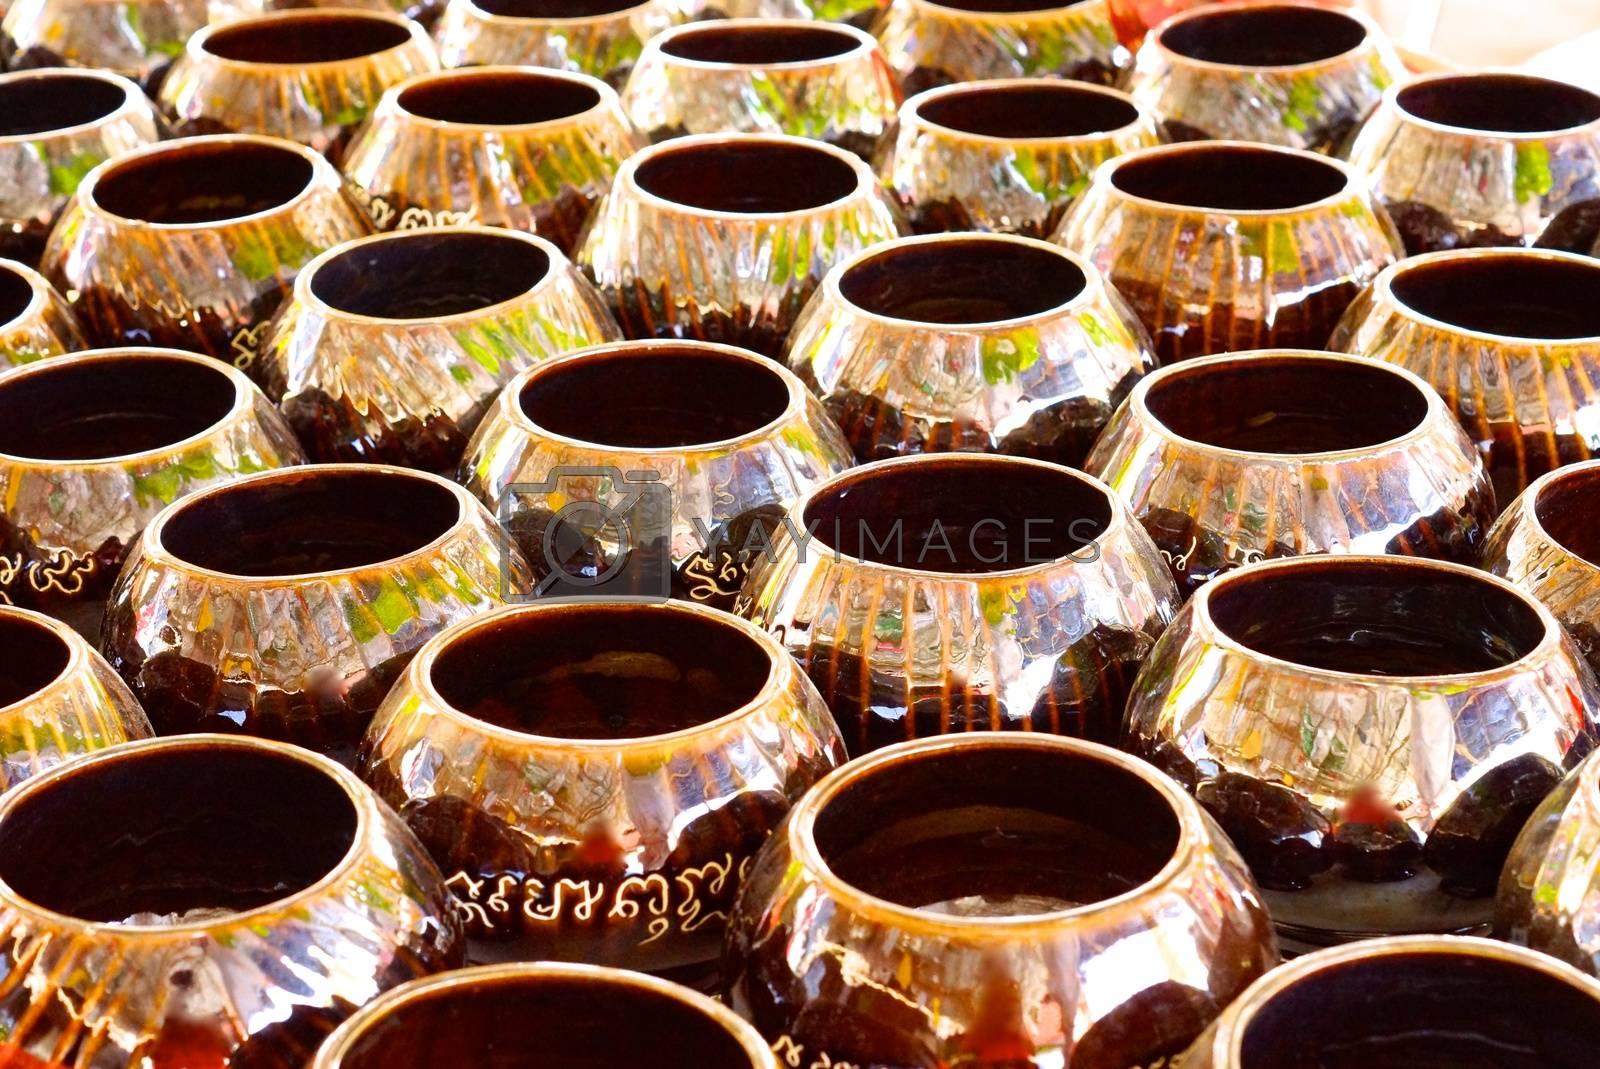 hundred of ceramic bowels,shallow focus